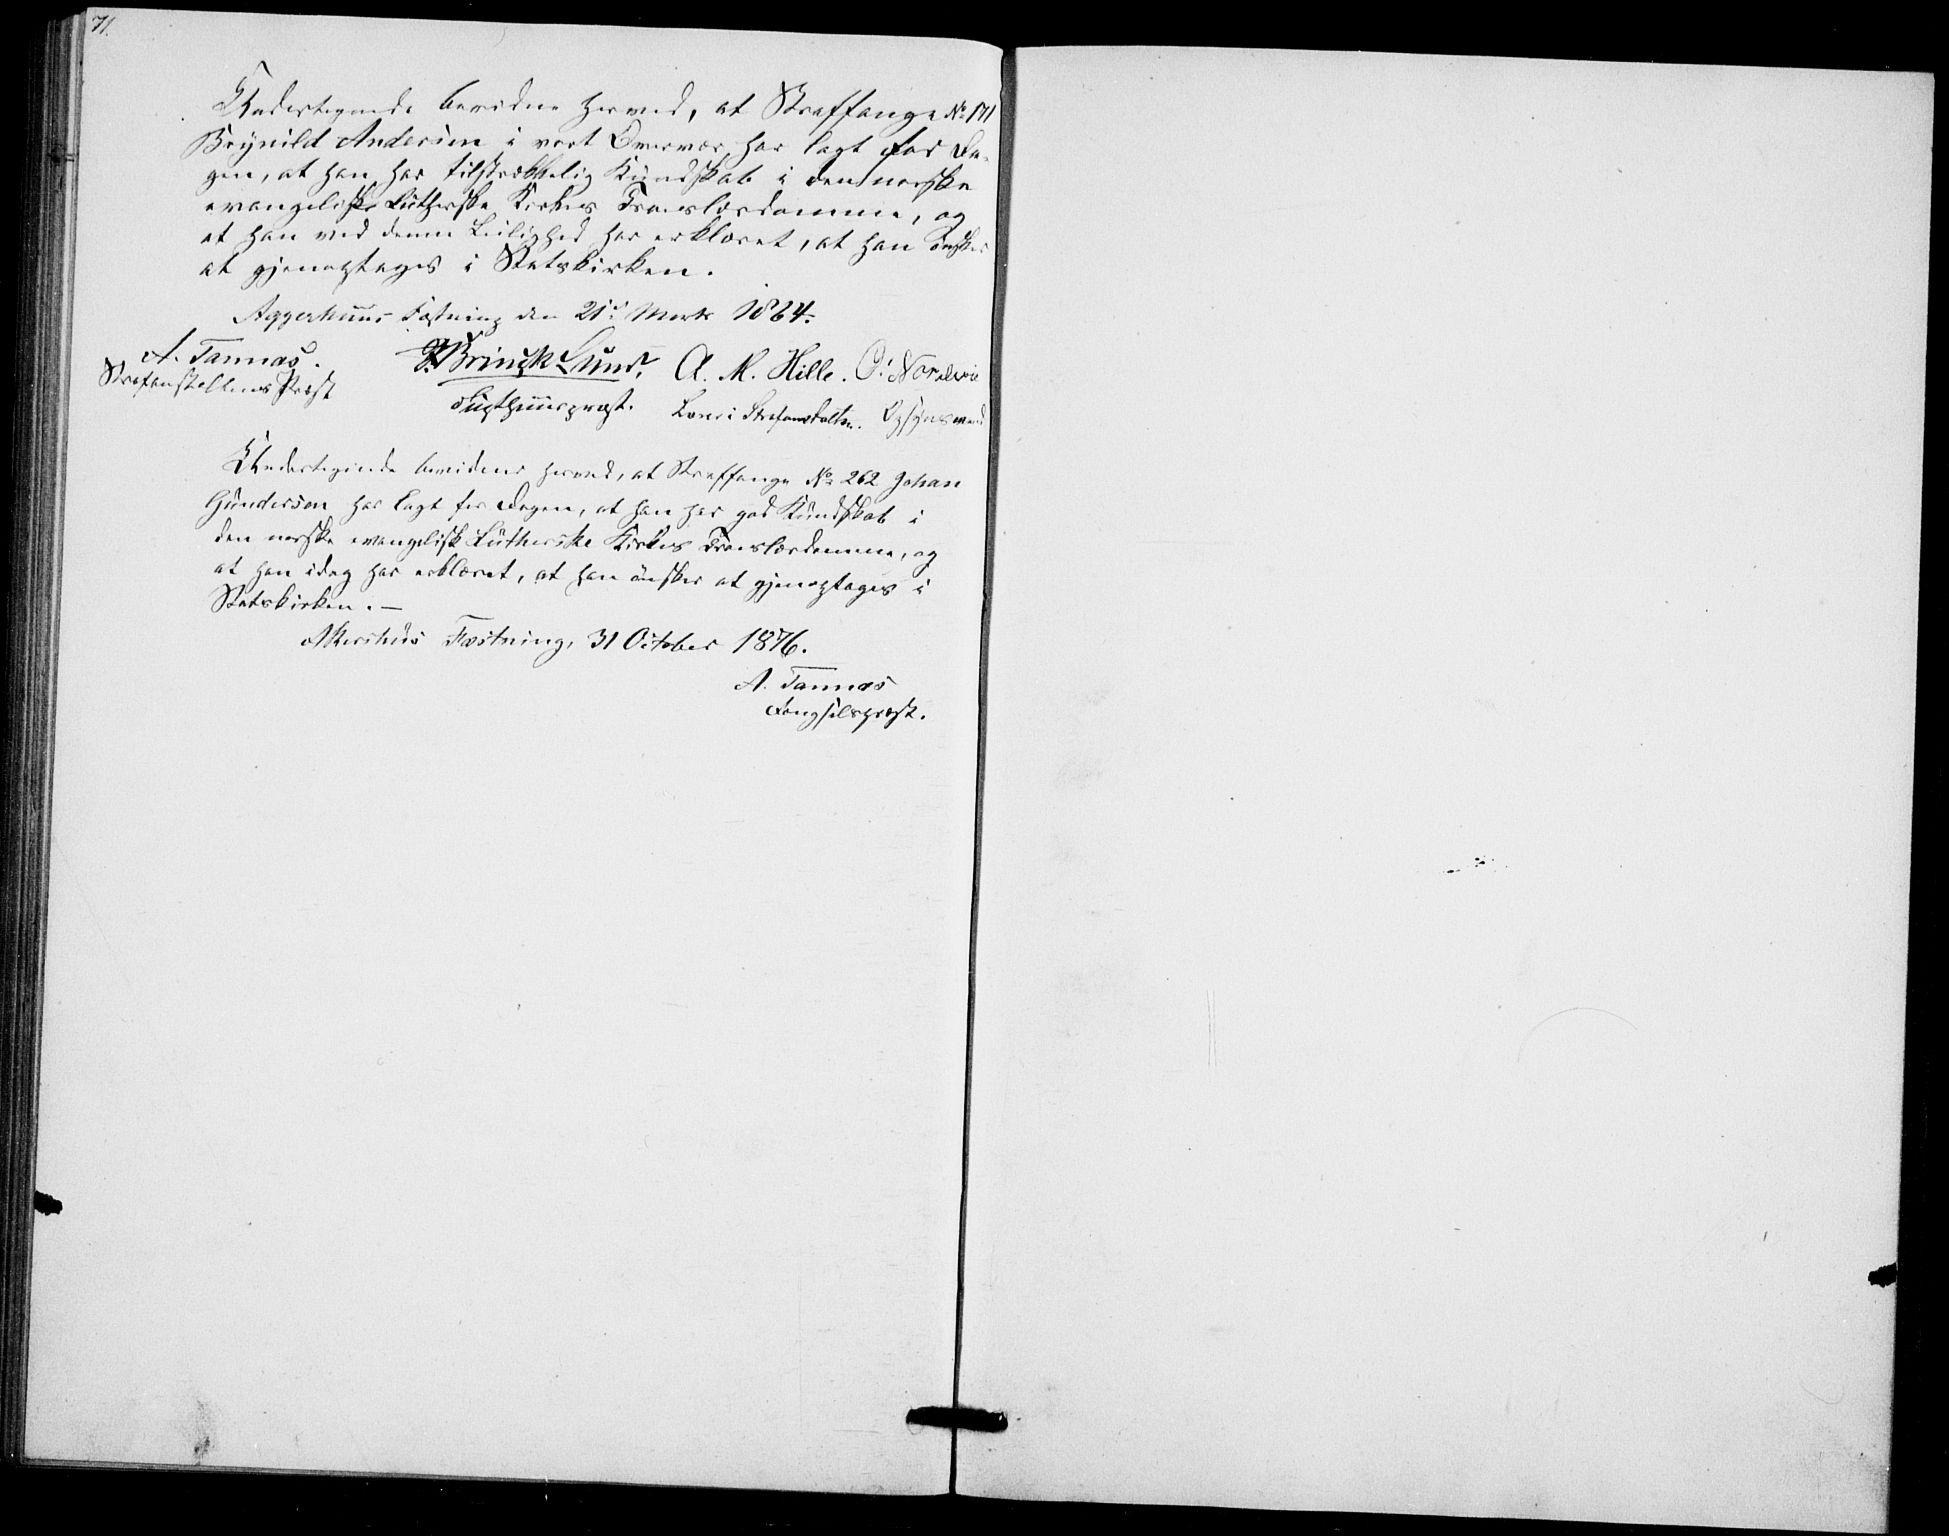 SAO, Akershus festnings slaveri Kirkebøker, F/Fa/L0002: Ministerialbok nr. 2, 1852-1883, s. 71